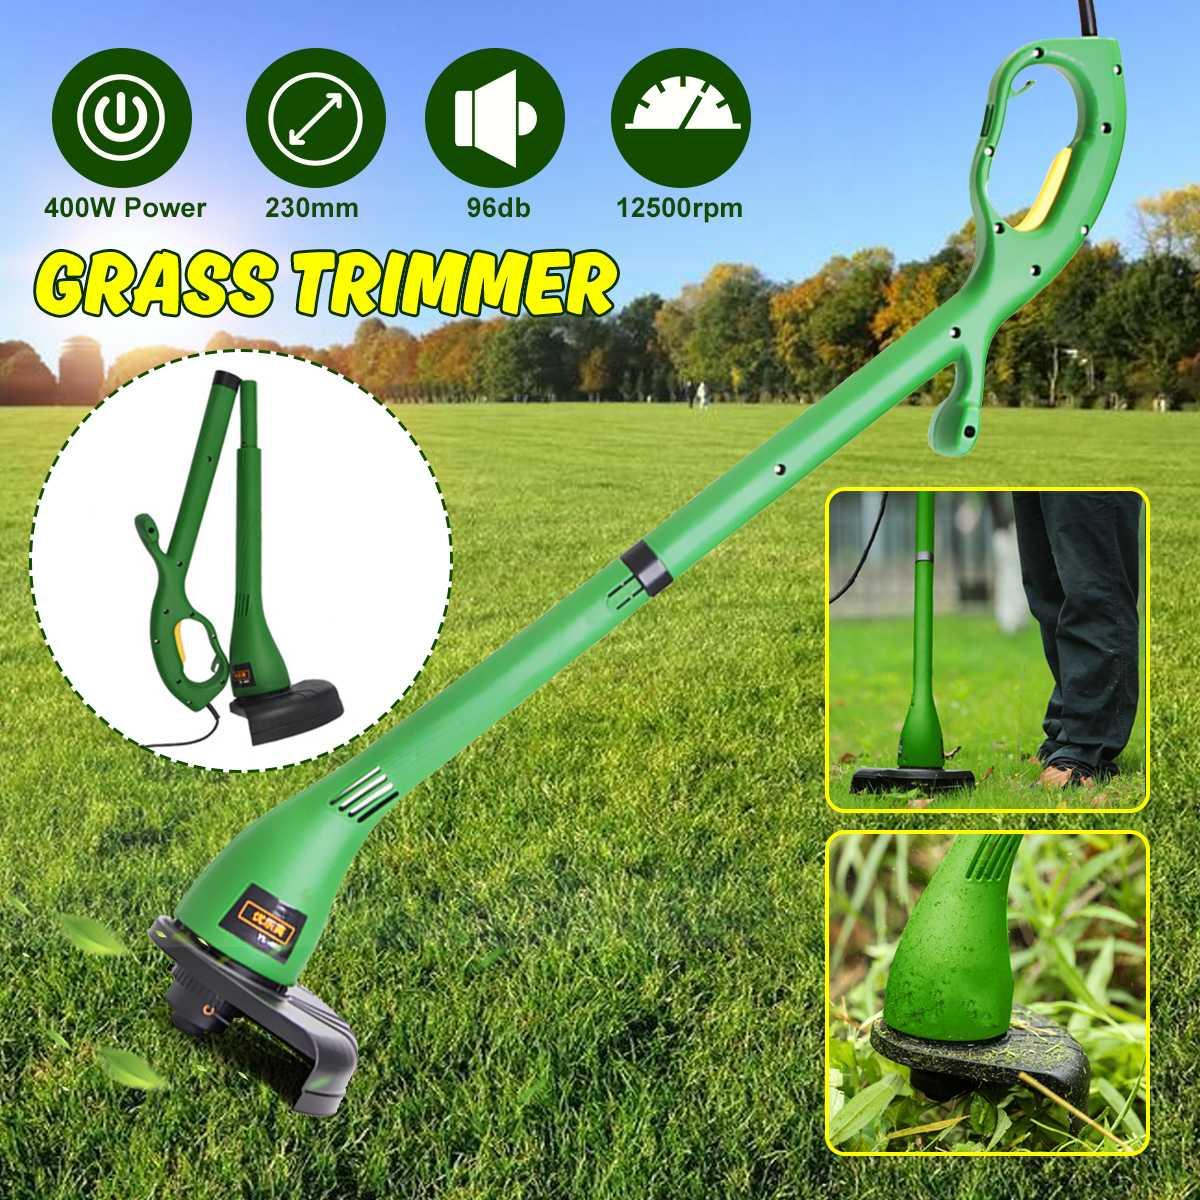 220V Home Electric Lawn Mower Portable 500W Grass Trimmer Garden Lawn Mower Weeding Machine 12500RPM